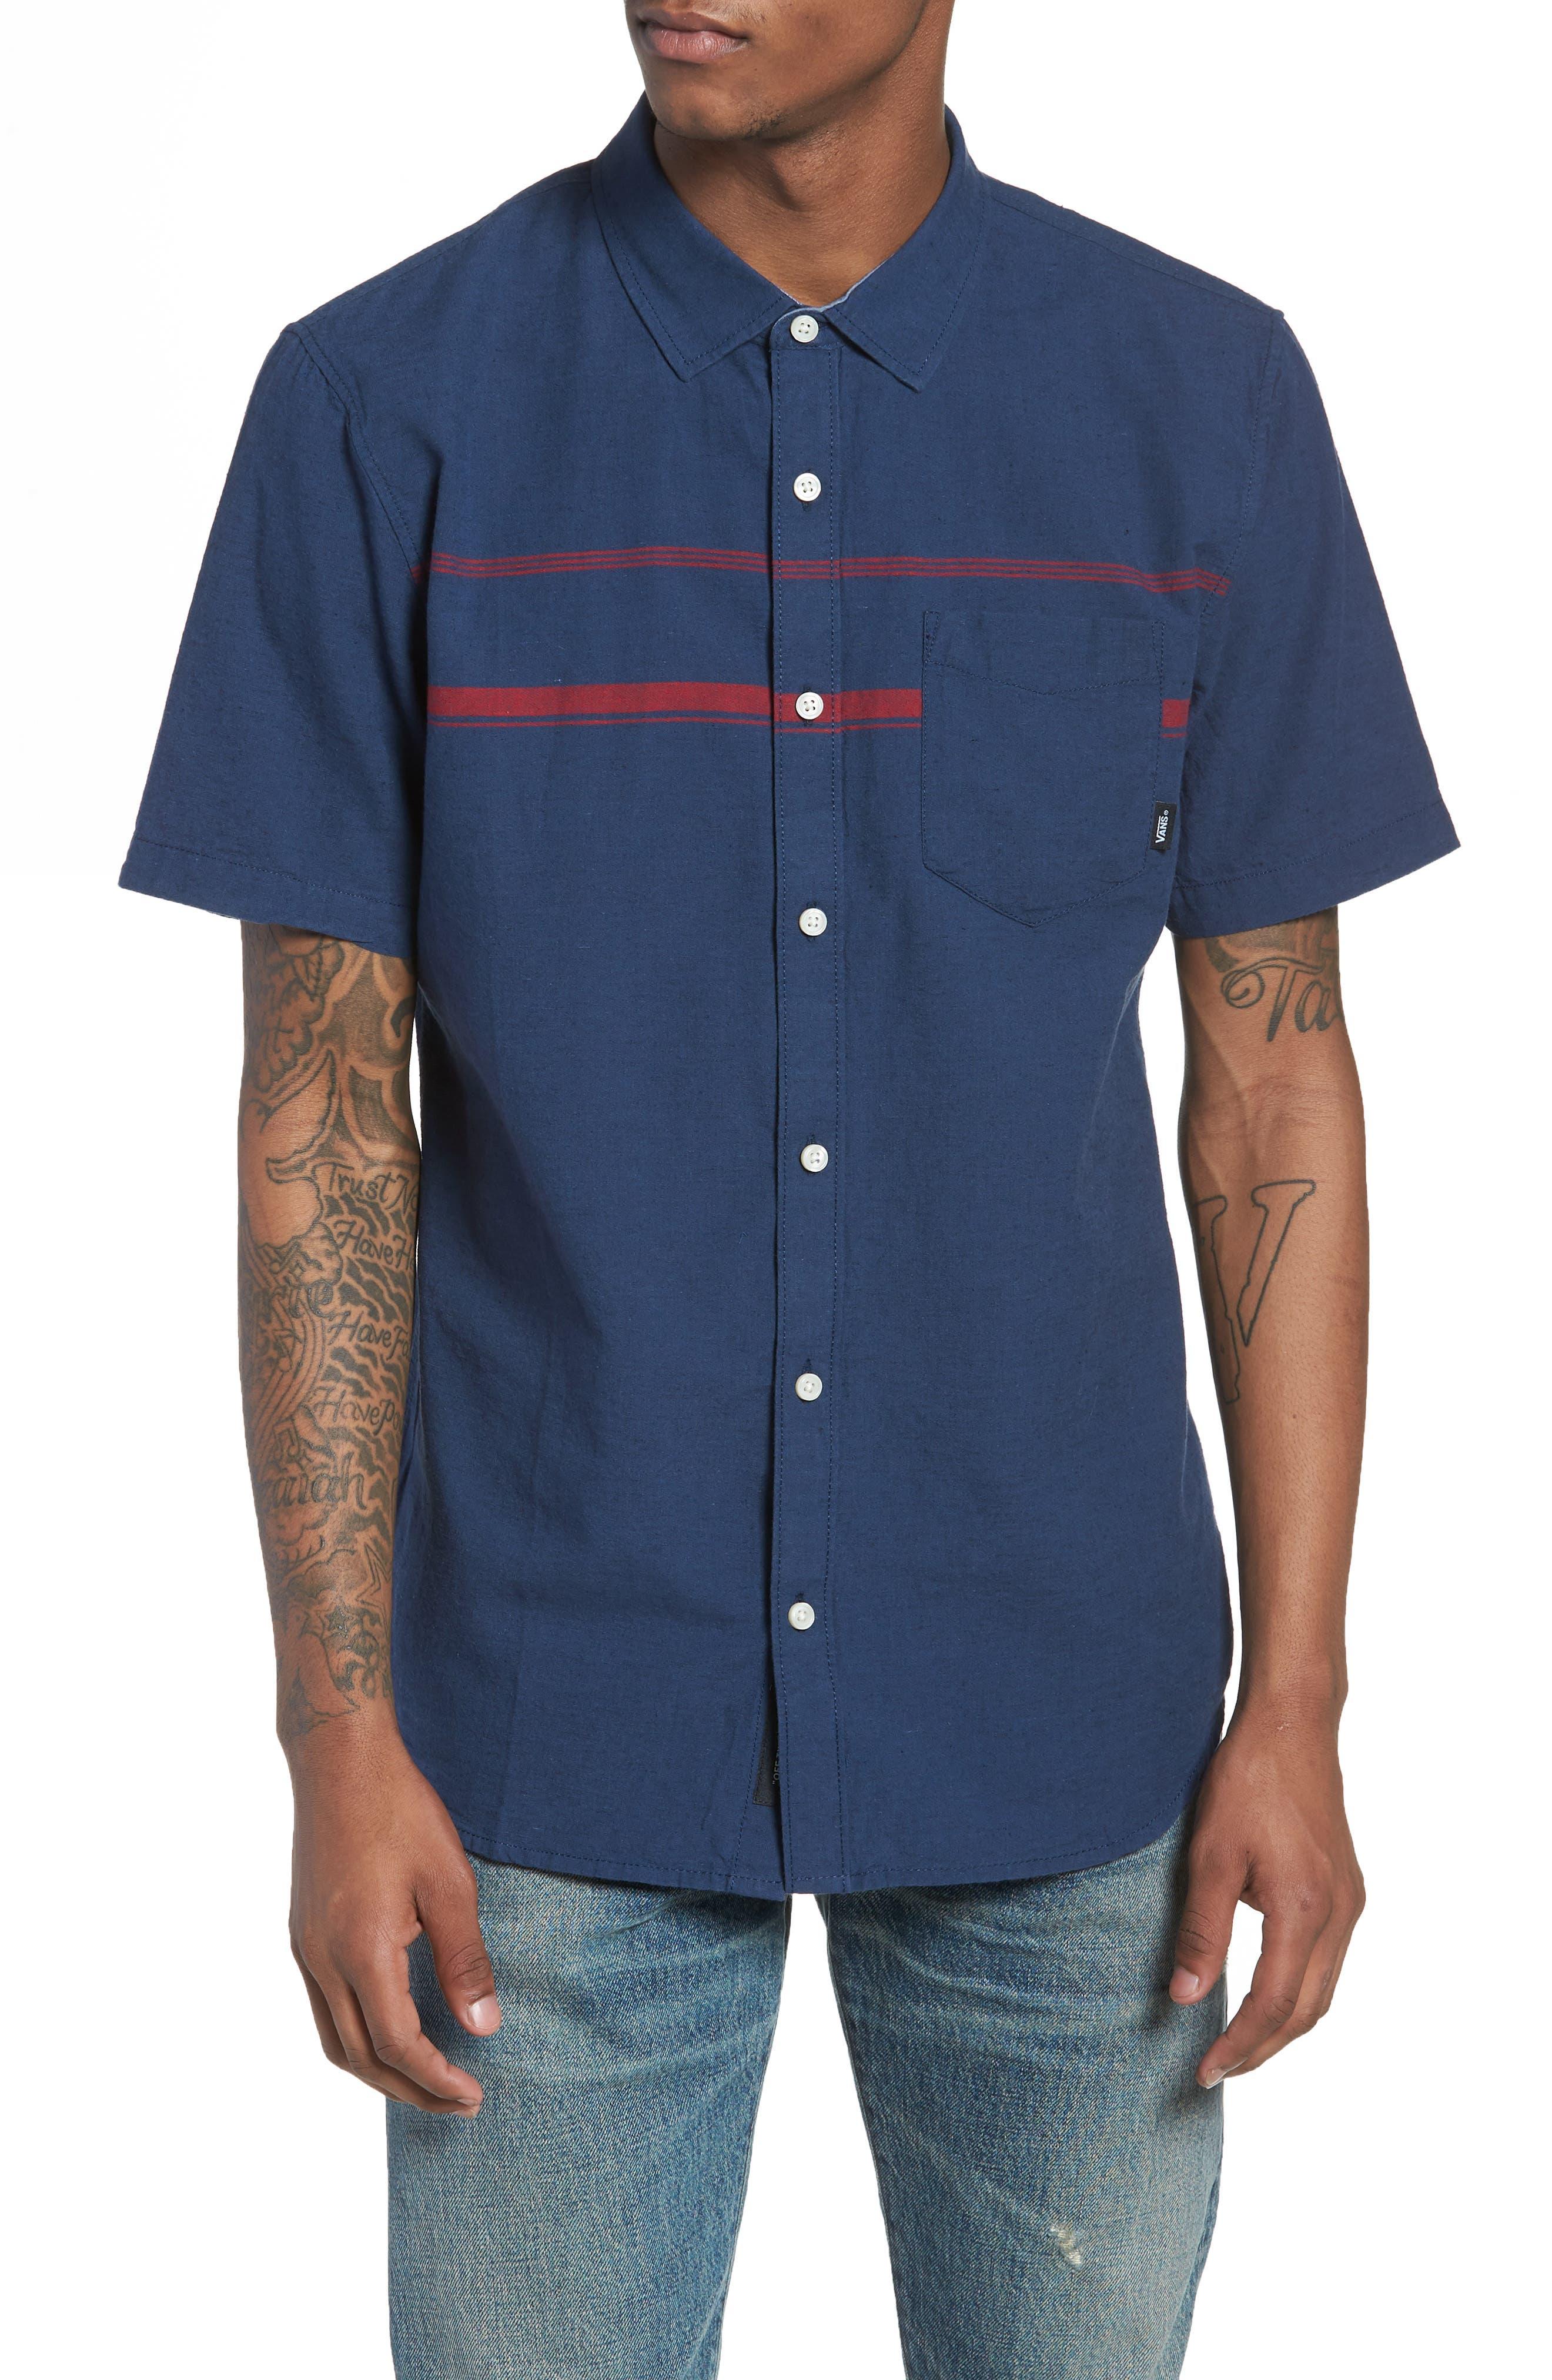 Thurber Short Sleeve Shirt,                             Main thumbnail 1, color,                             Dress Blues